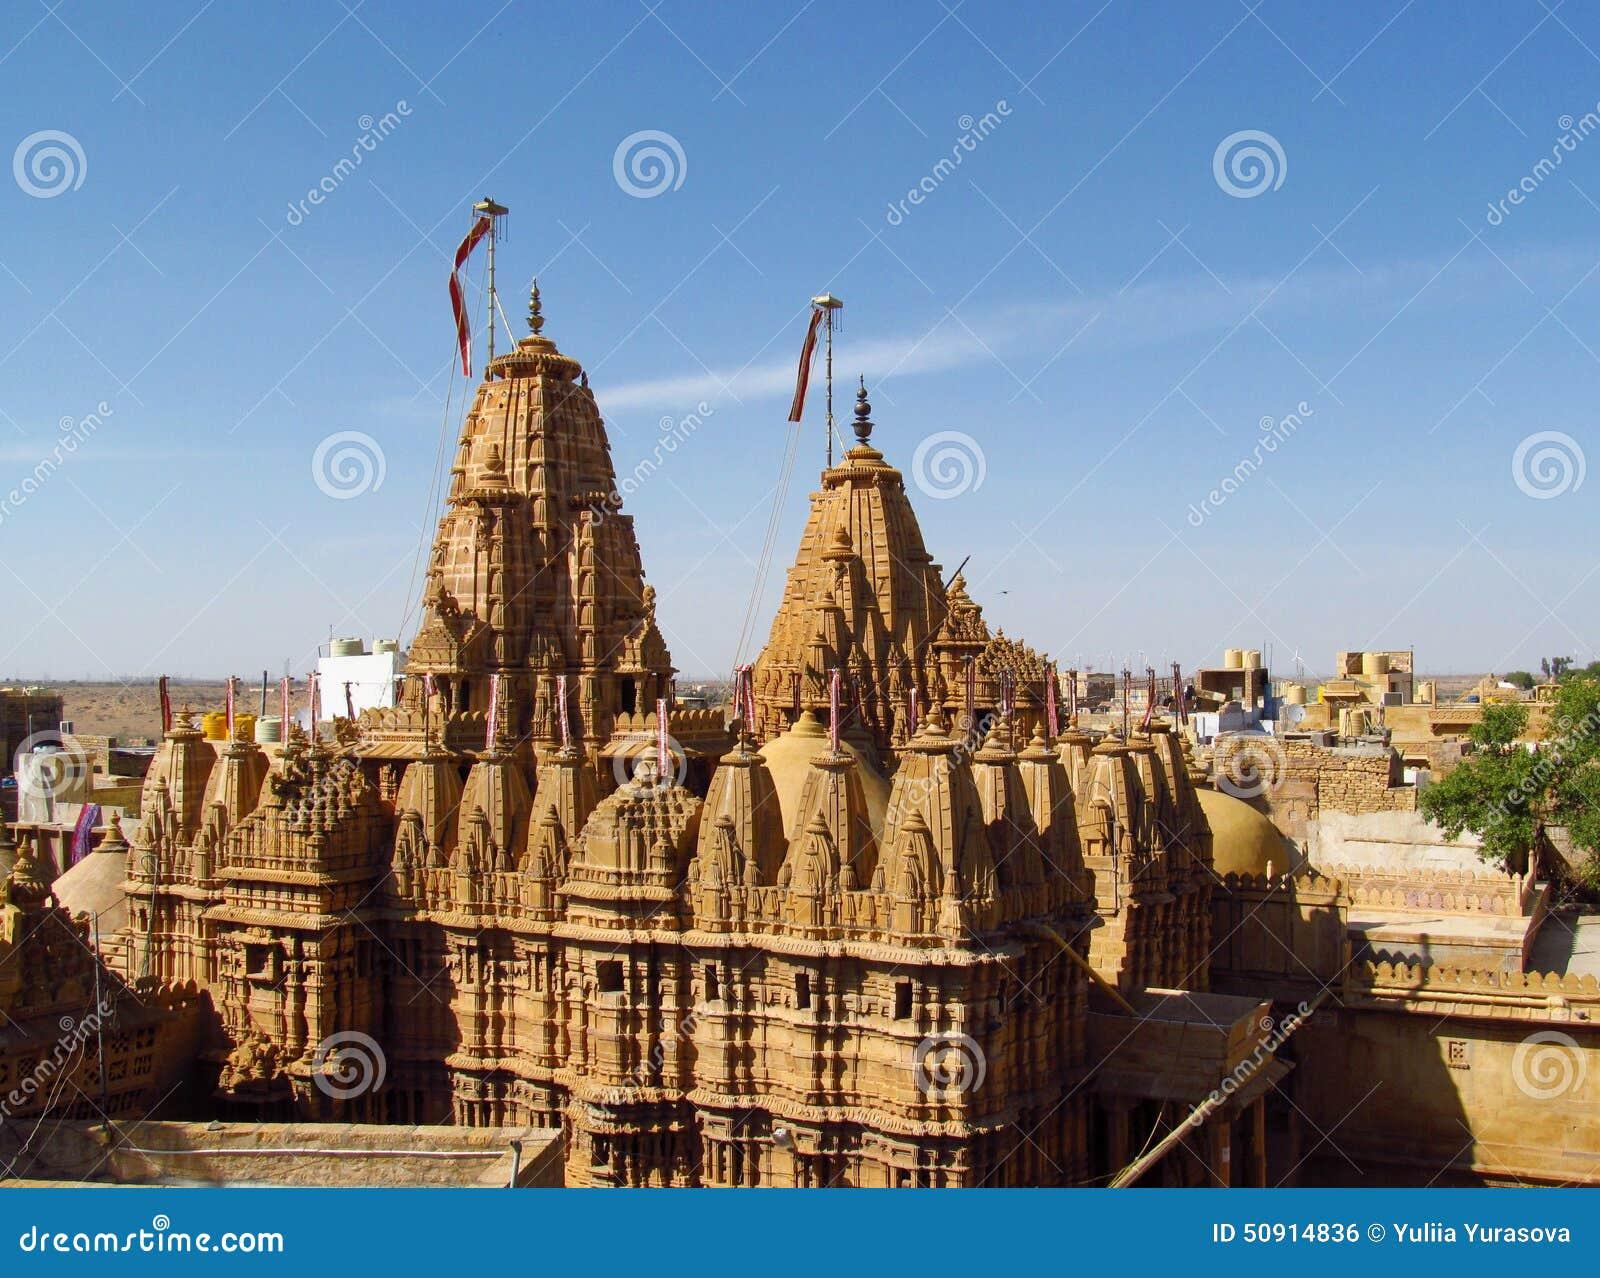 Jain temple in india jainism stock photo image 50914836 for Religious buildings in india